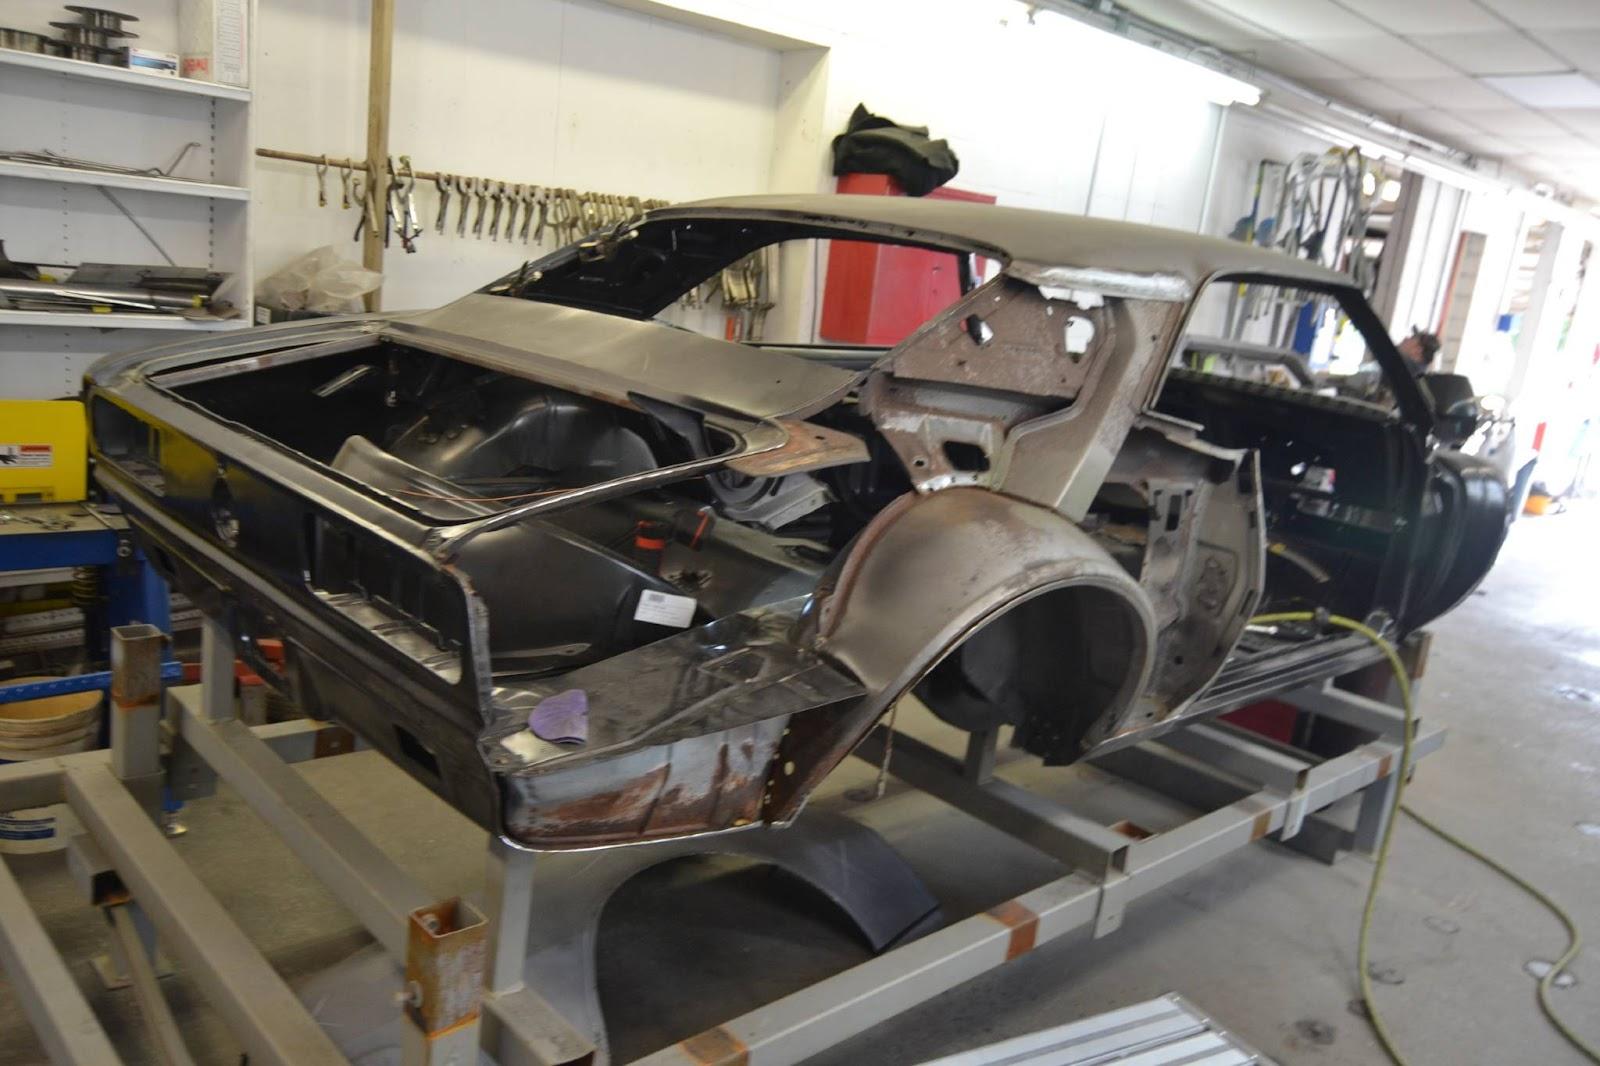 Sheetmetal Repairs on a '67 Camaro RS